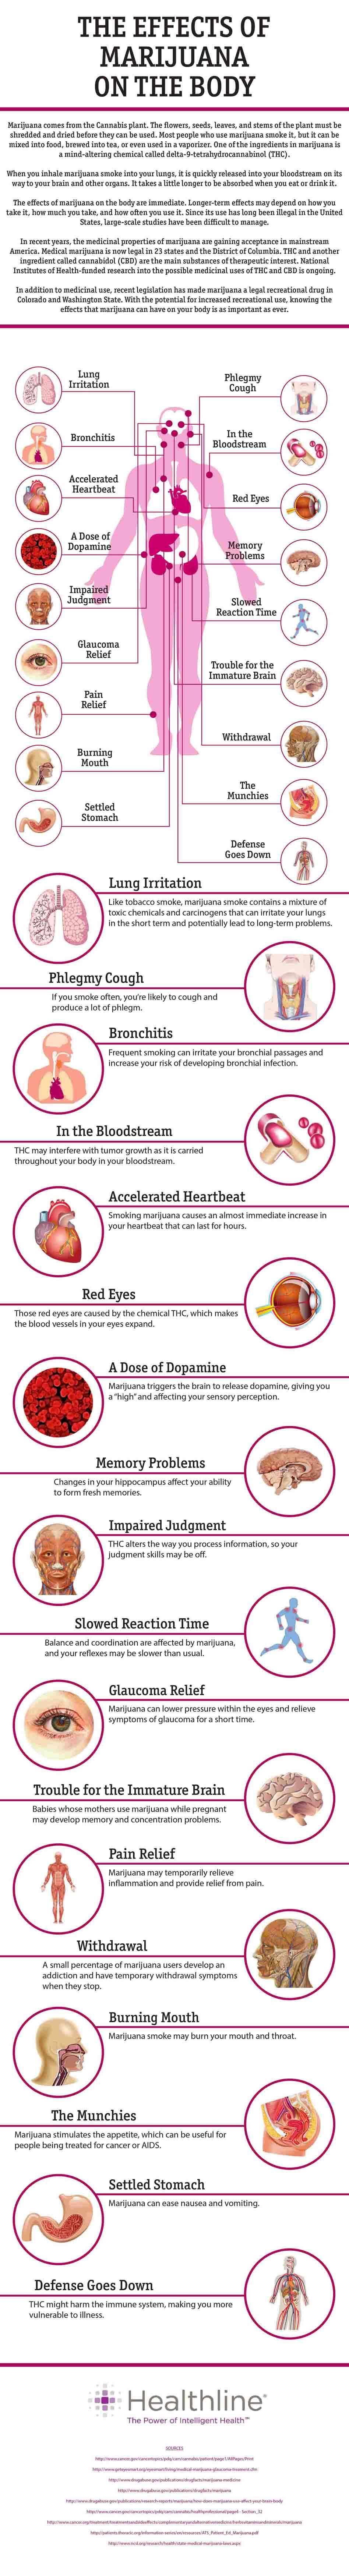 The Effects of Marijuana on the Body